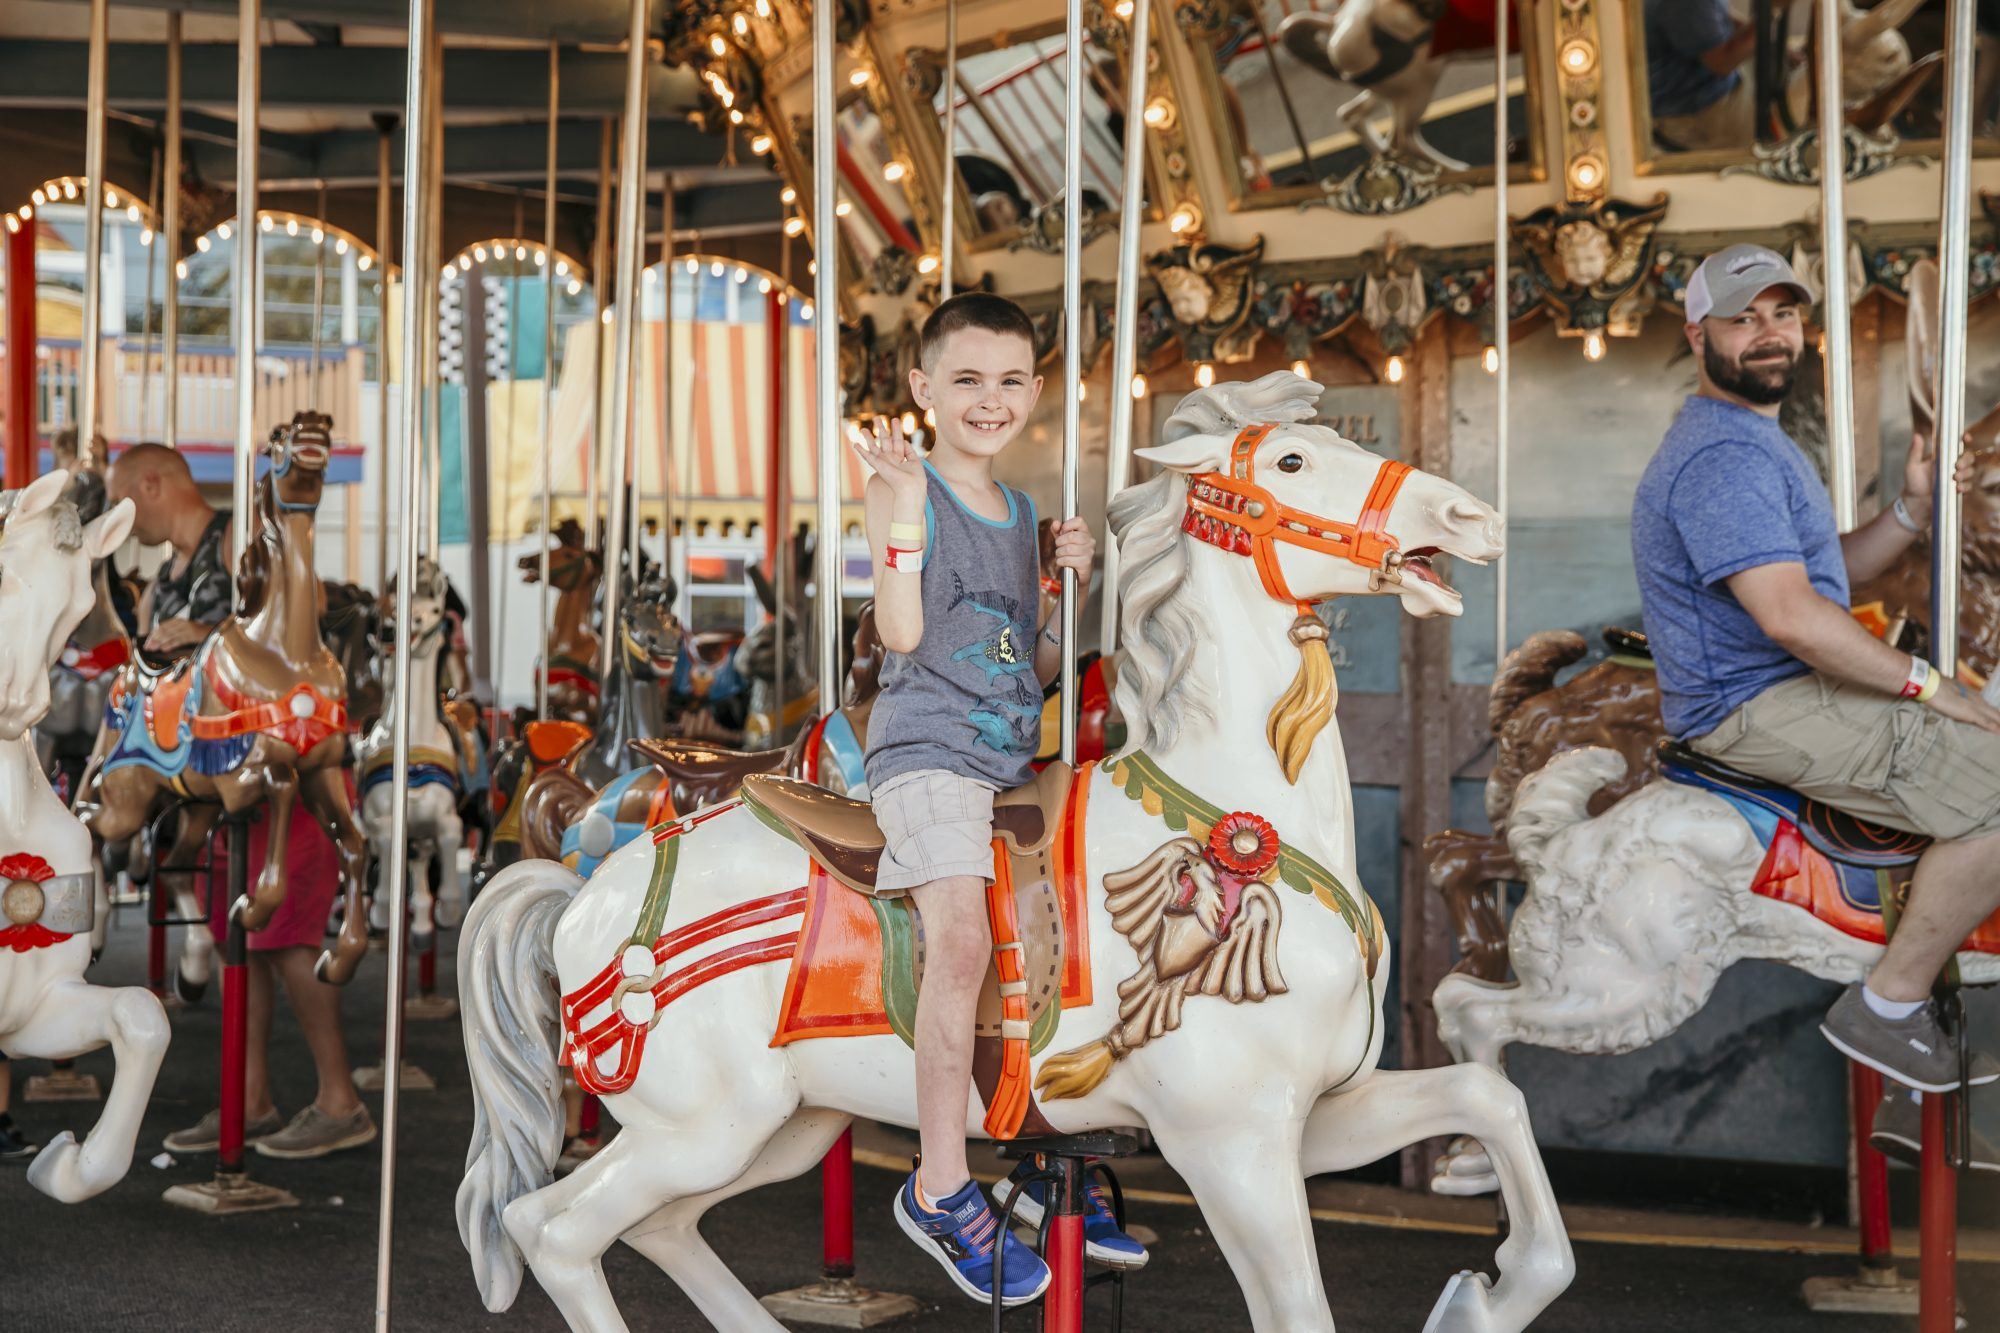 max riding the carousel in cedar point